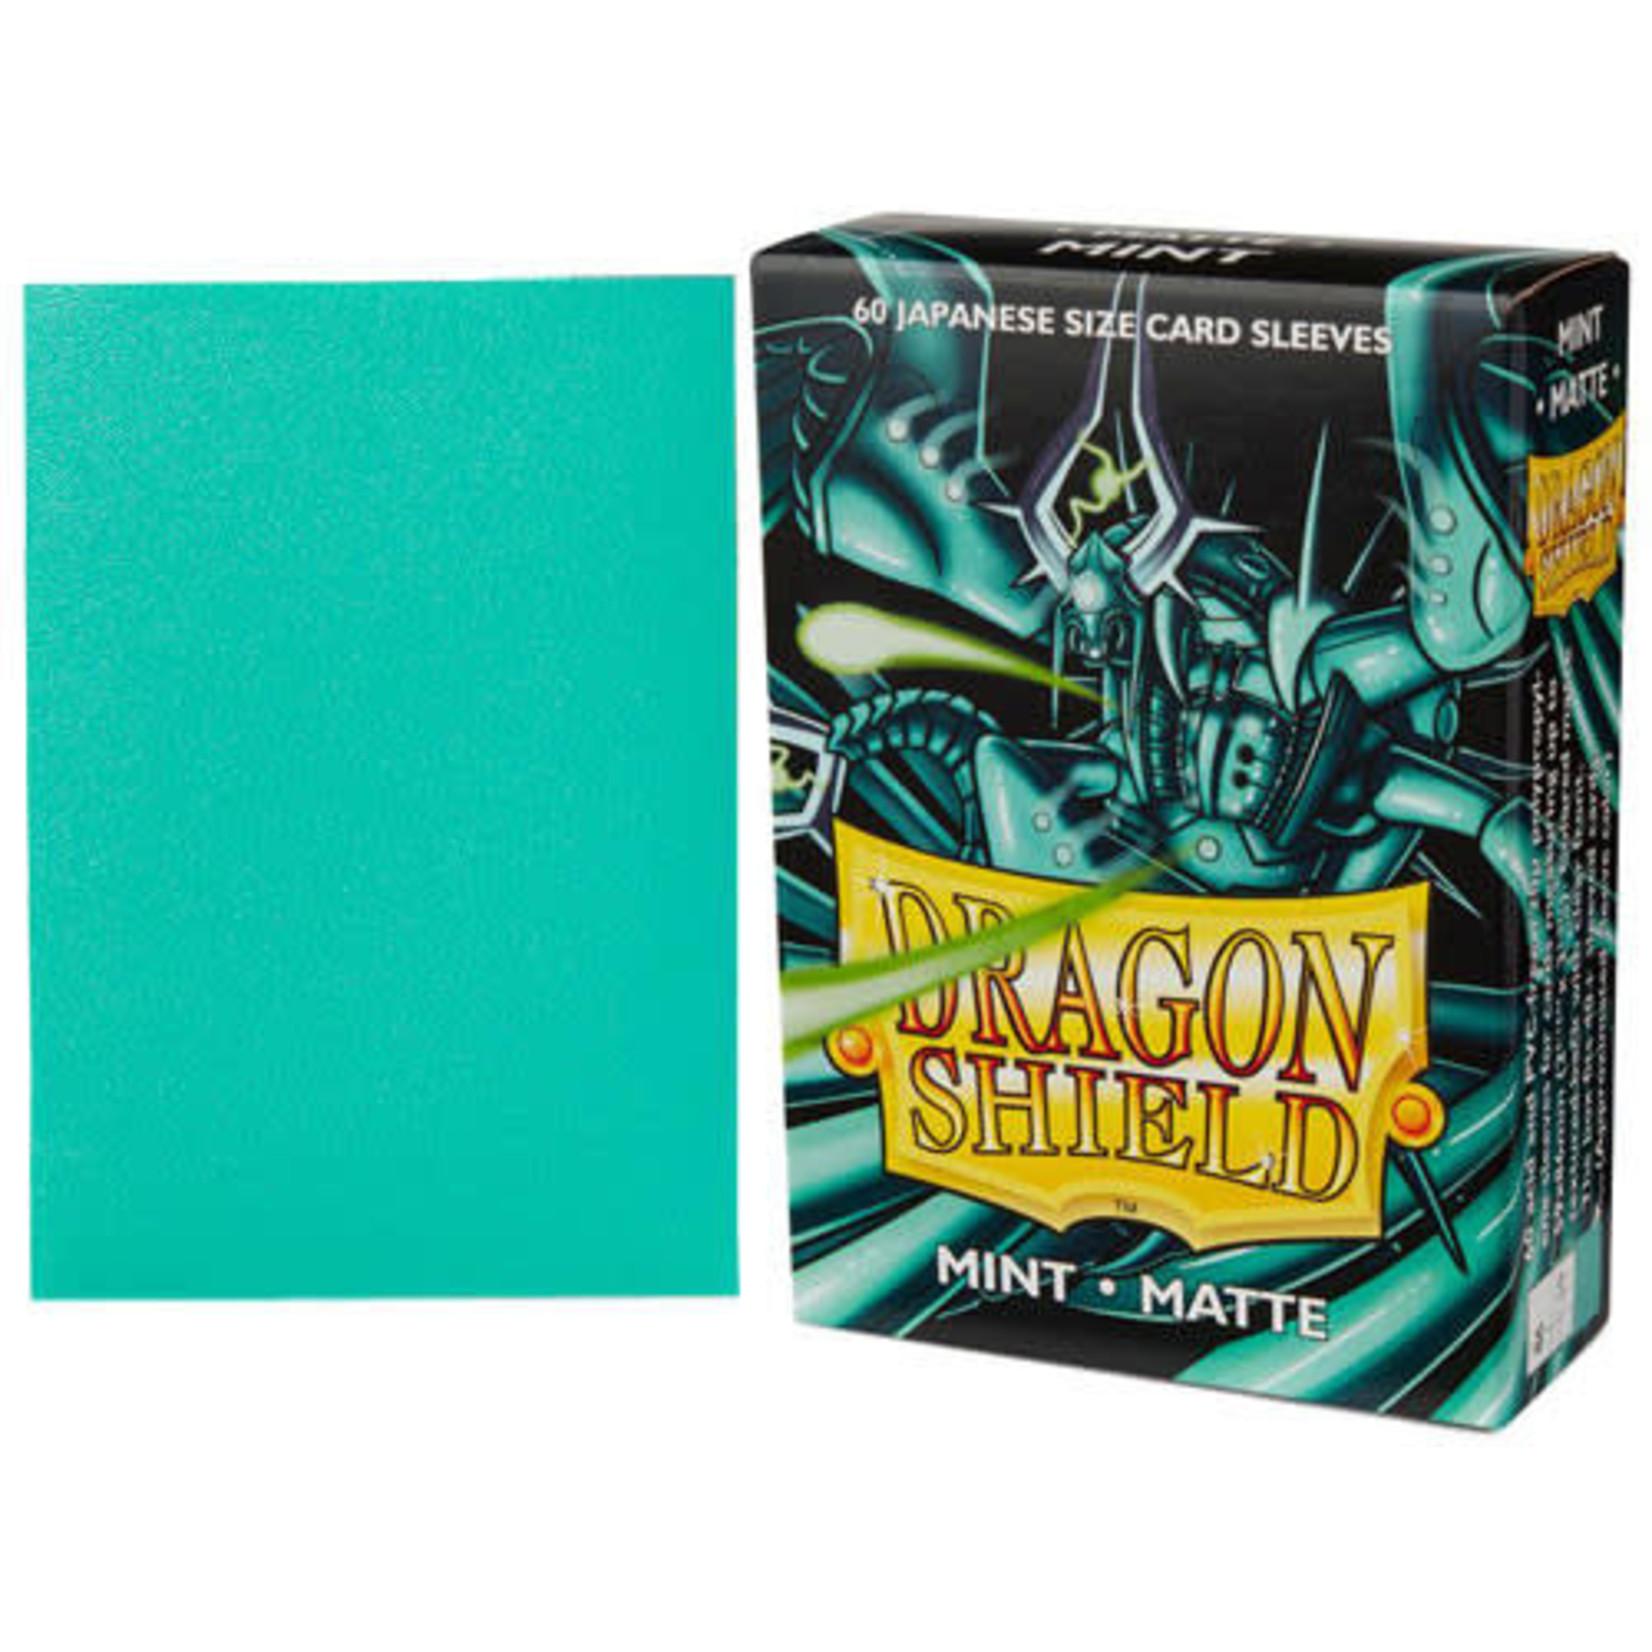 Dragon Shield Matte Mint (60 count) Small